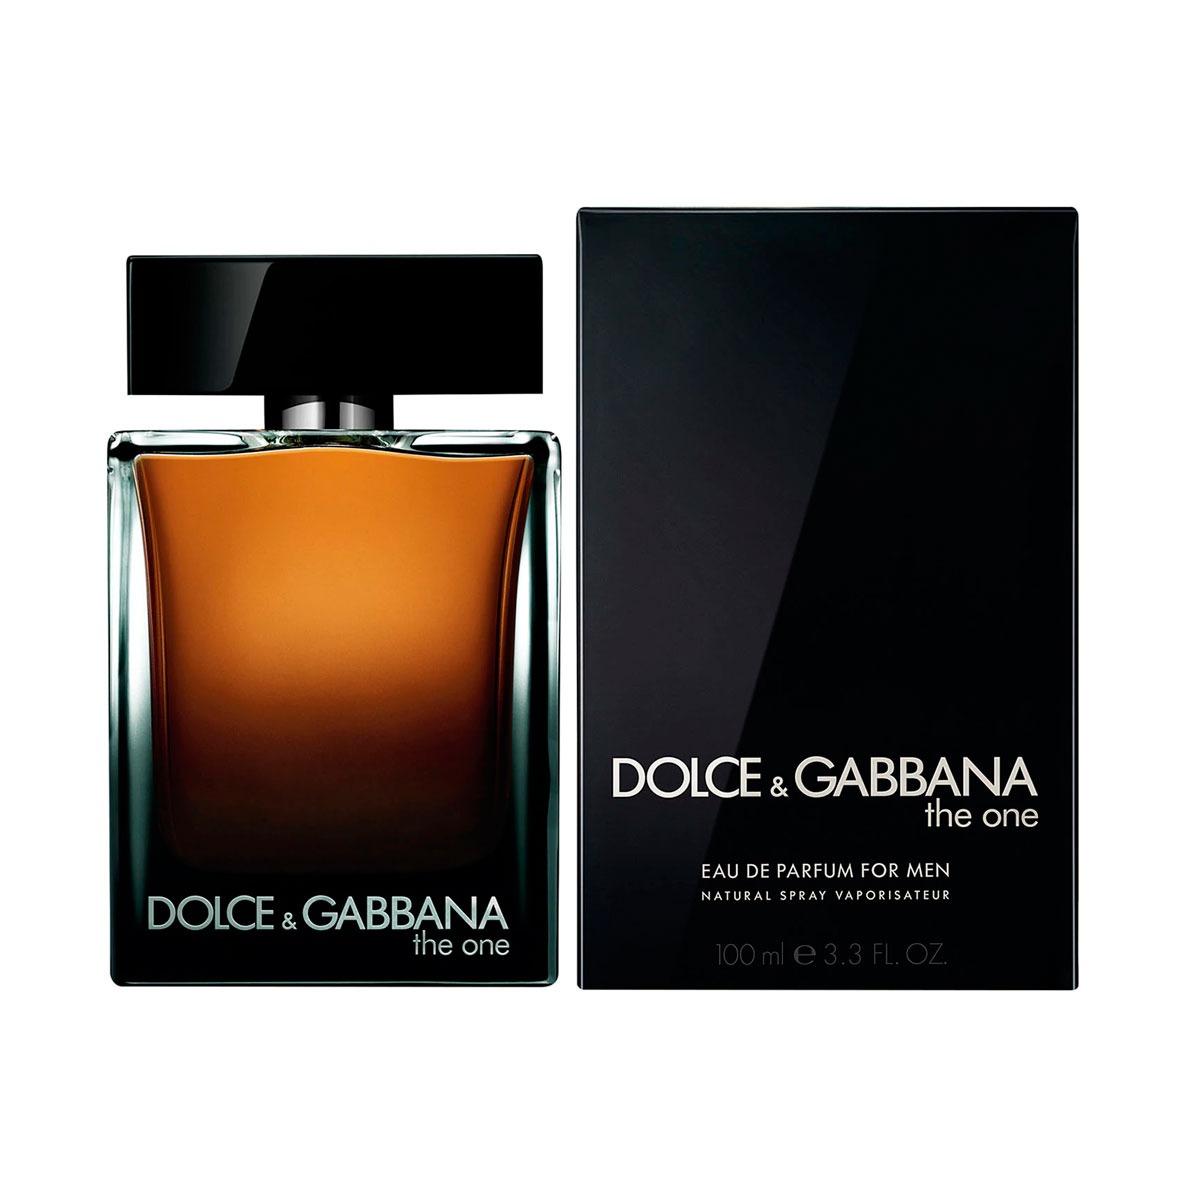 Dolce-Gabbana-The-One-100-sp.jpg